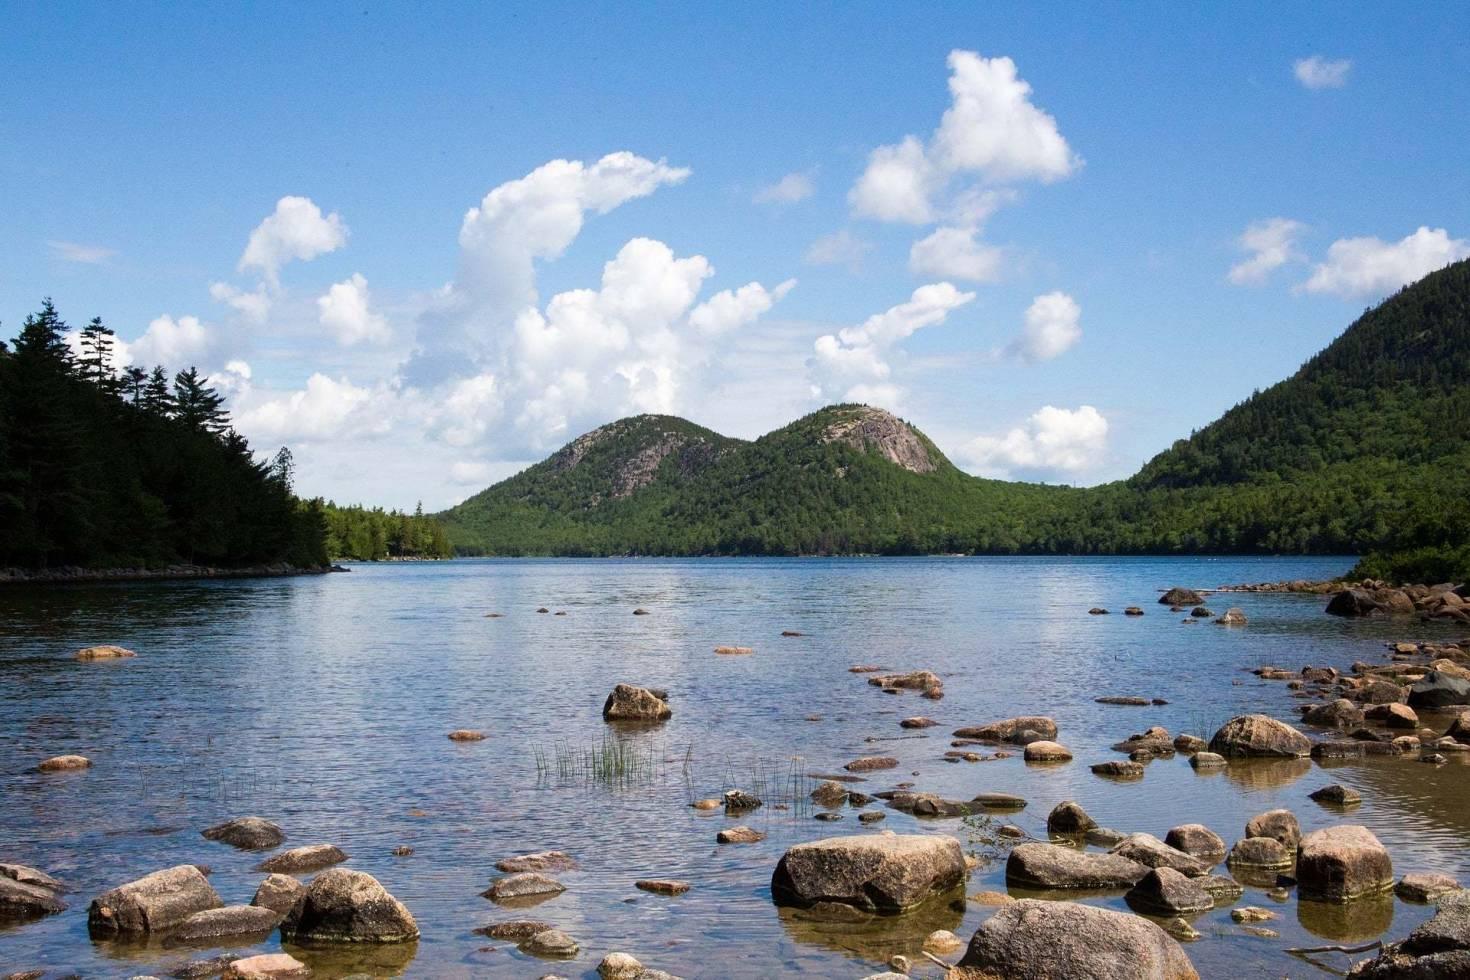 Jordan Pond in Acadia National Park